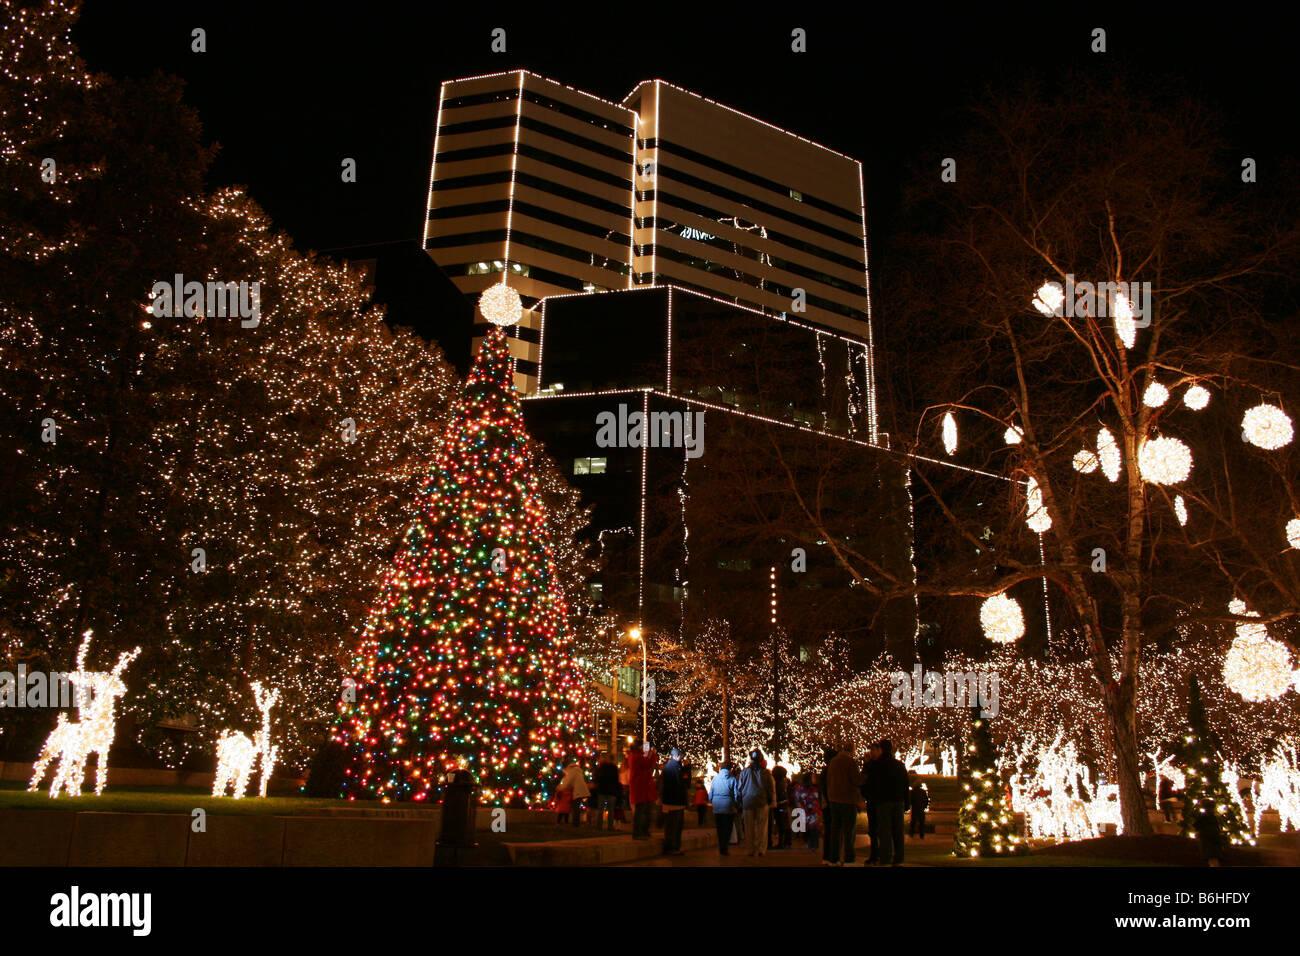 Christmas Lighting Richmond Va.Christmas Lights In Downtown Richmond Virginia Stock Photo